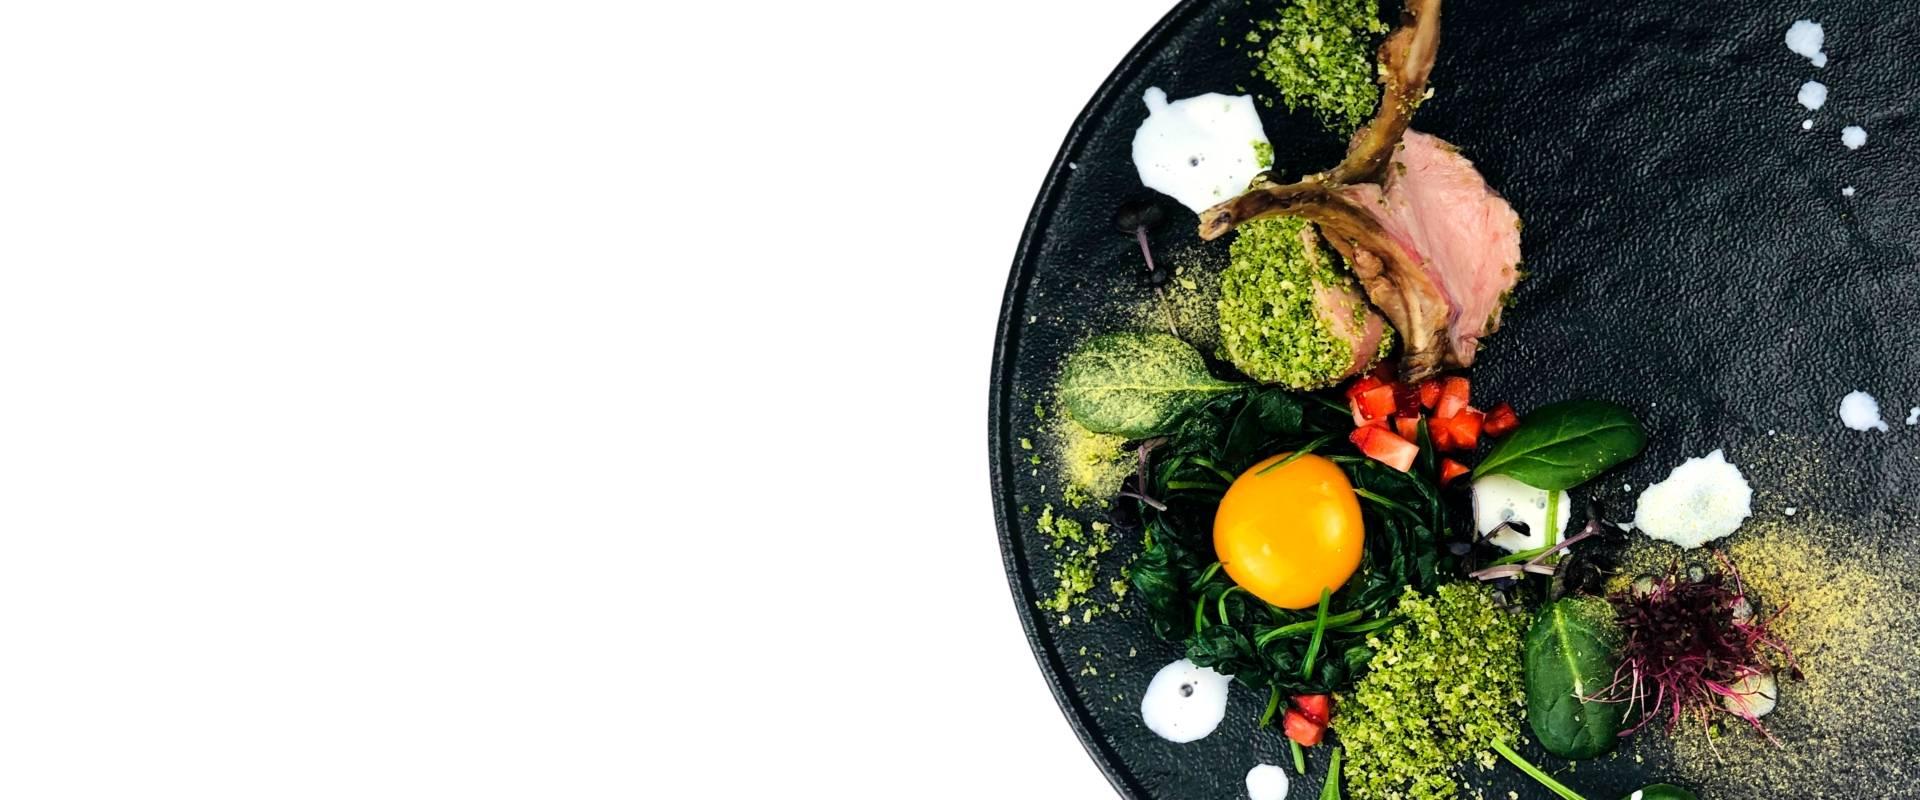 <small><small>кулинарный мастер-класс </small></small> <br>готовим как джейми оливер